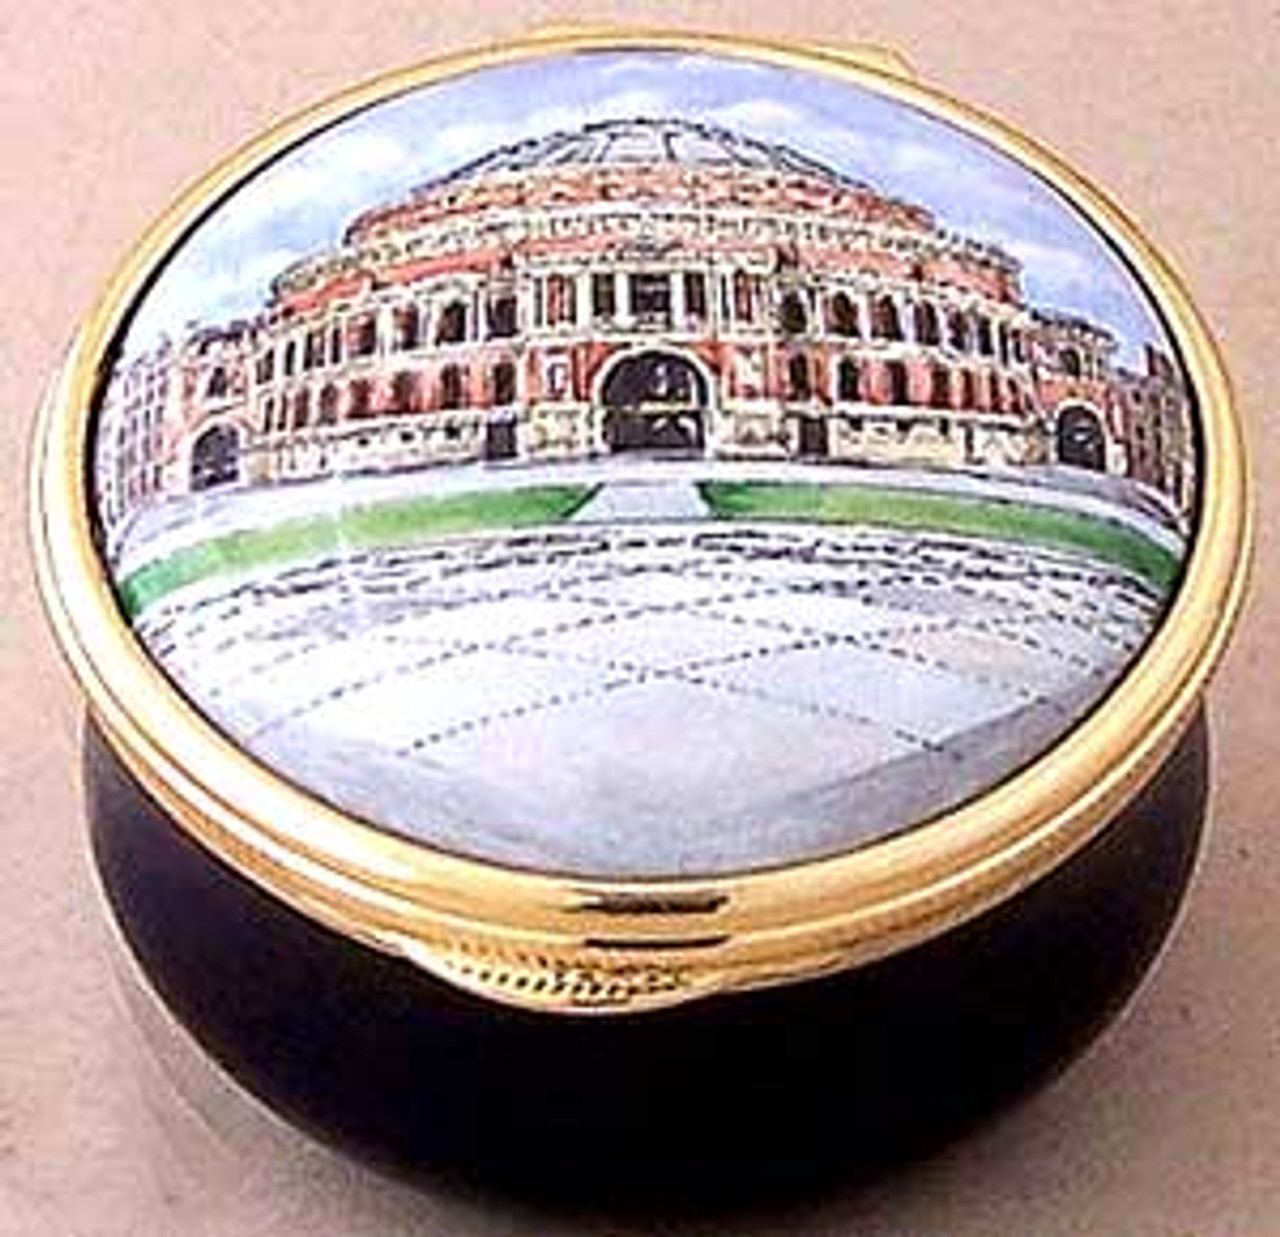 Staffordshire London-Royal Albert Hall